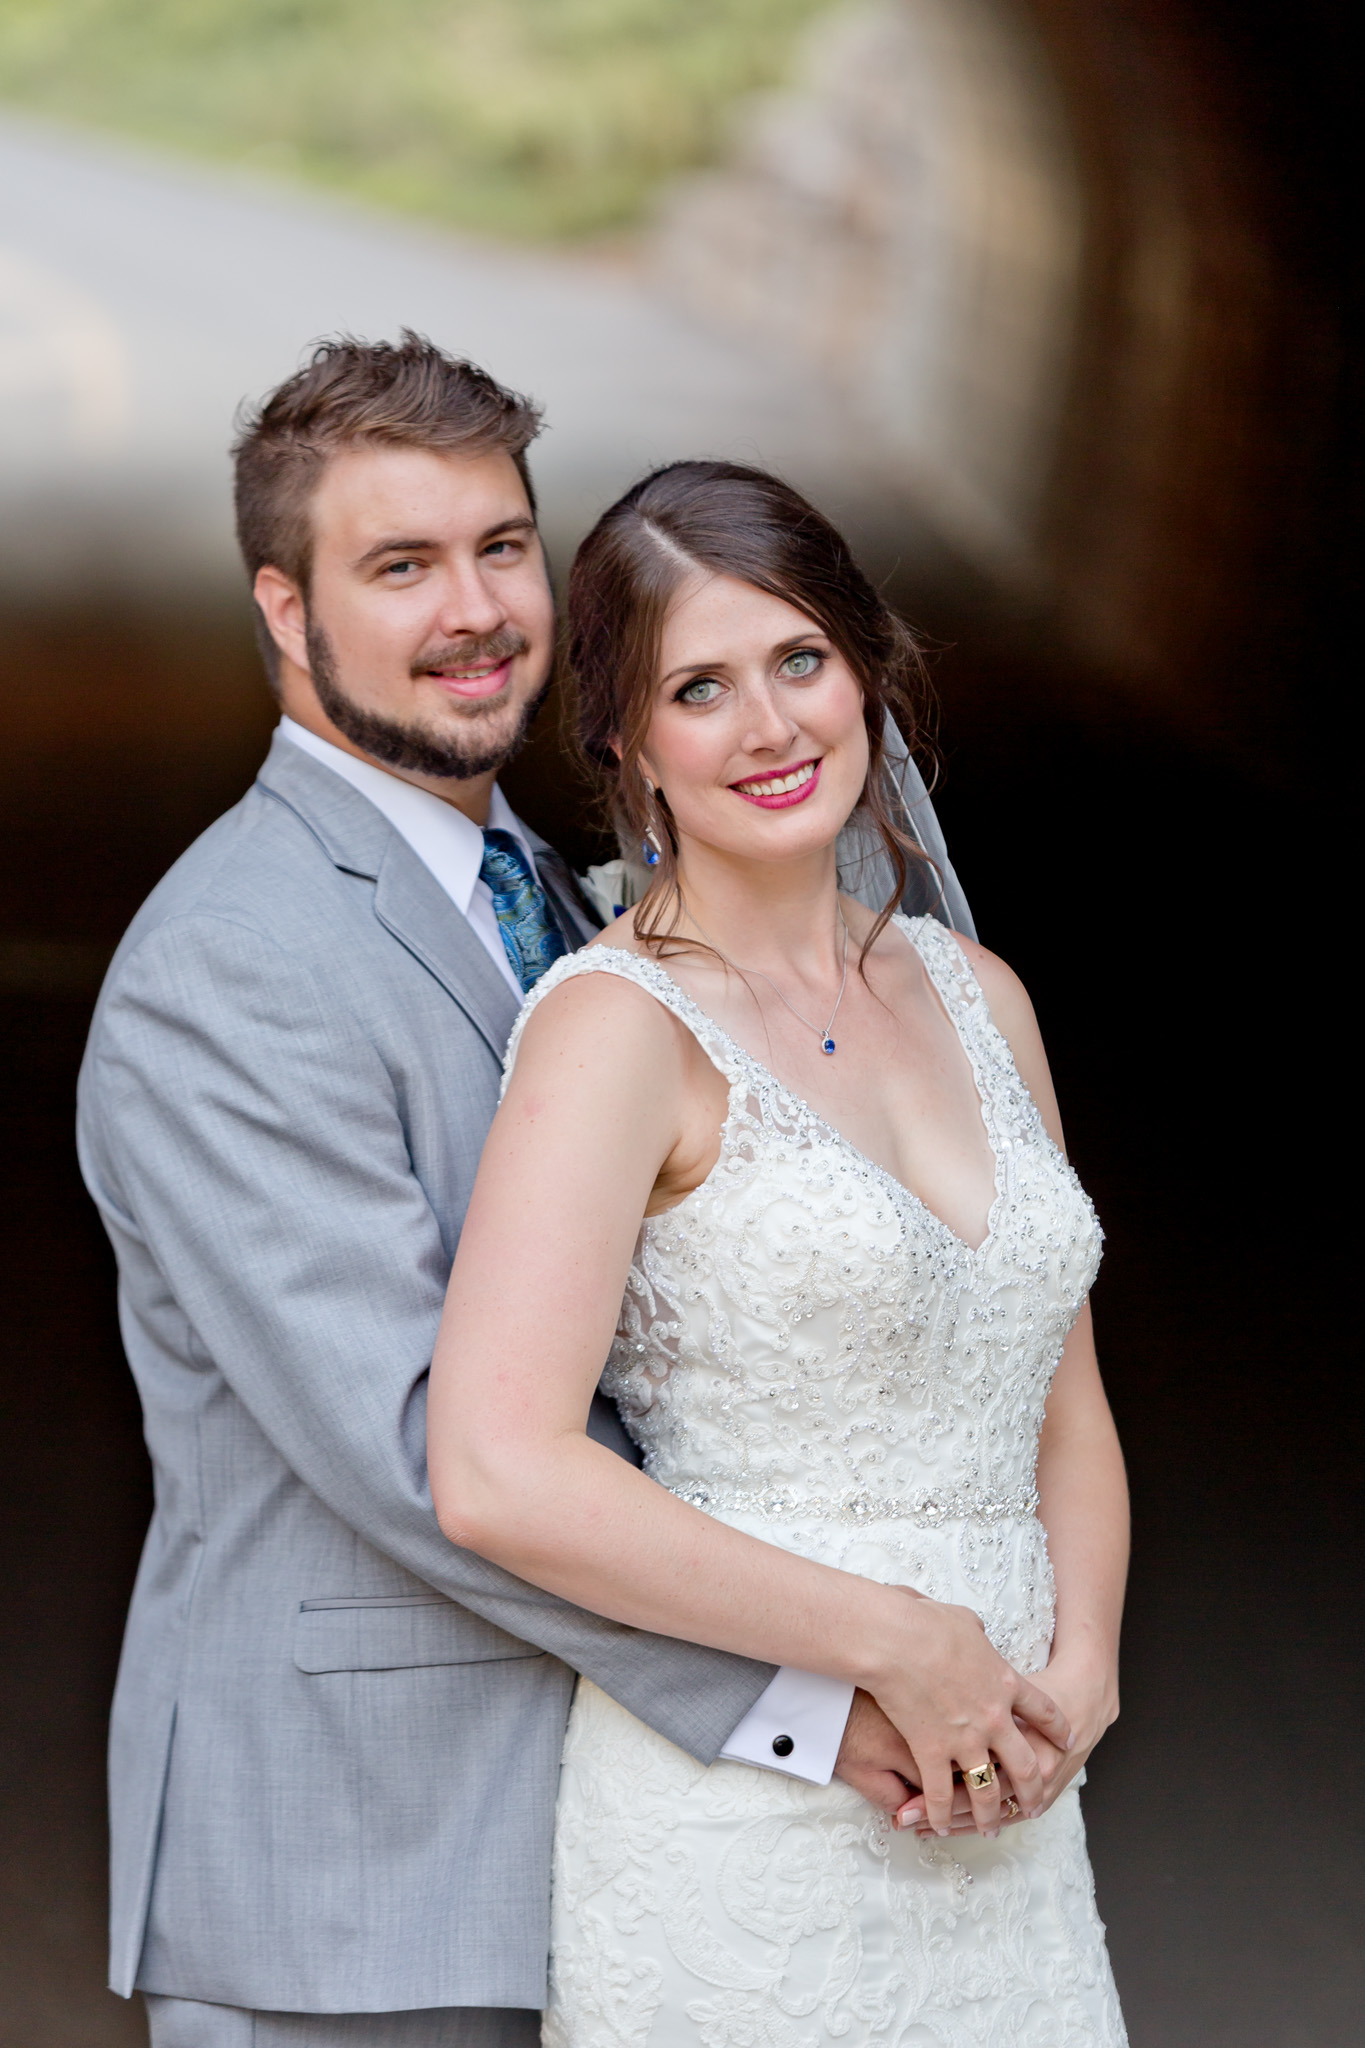 Brookstreet Hotel weddings #ottawa #wedding  #photographer-3213.jpg